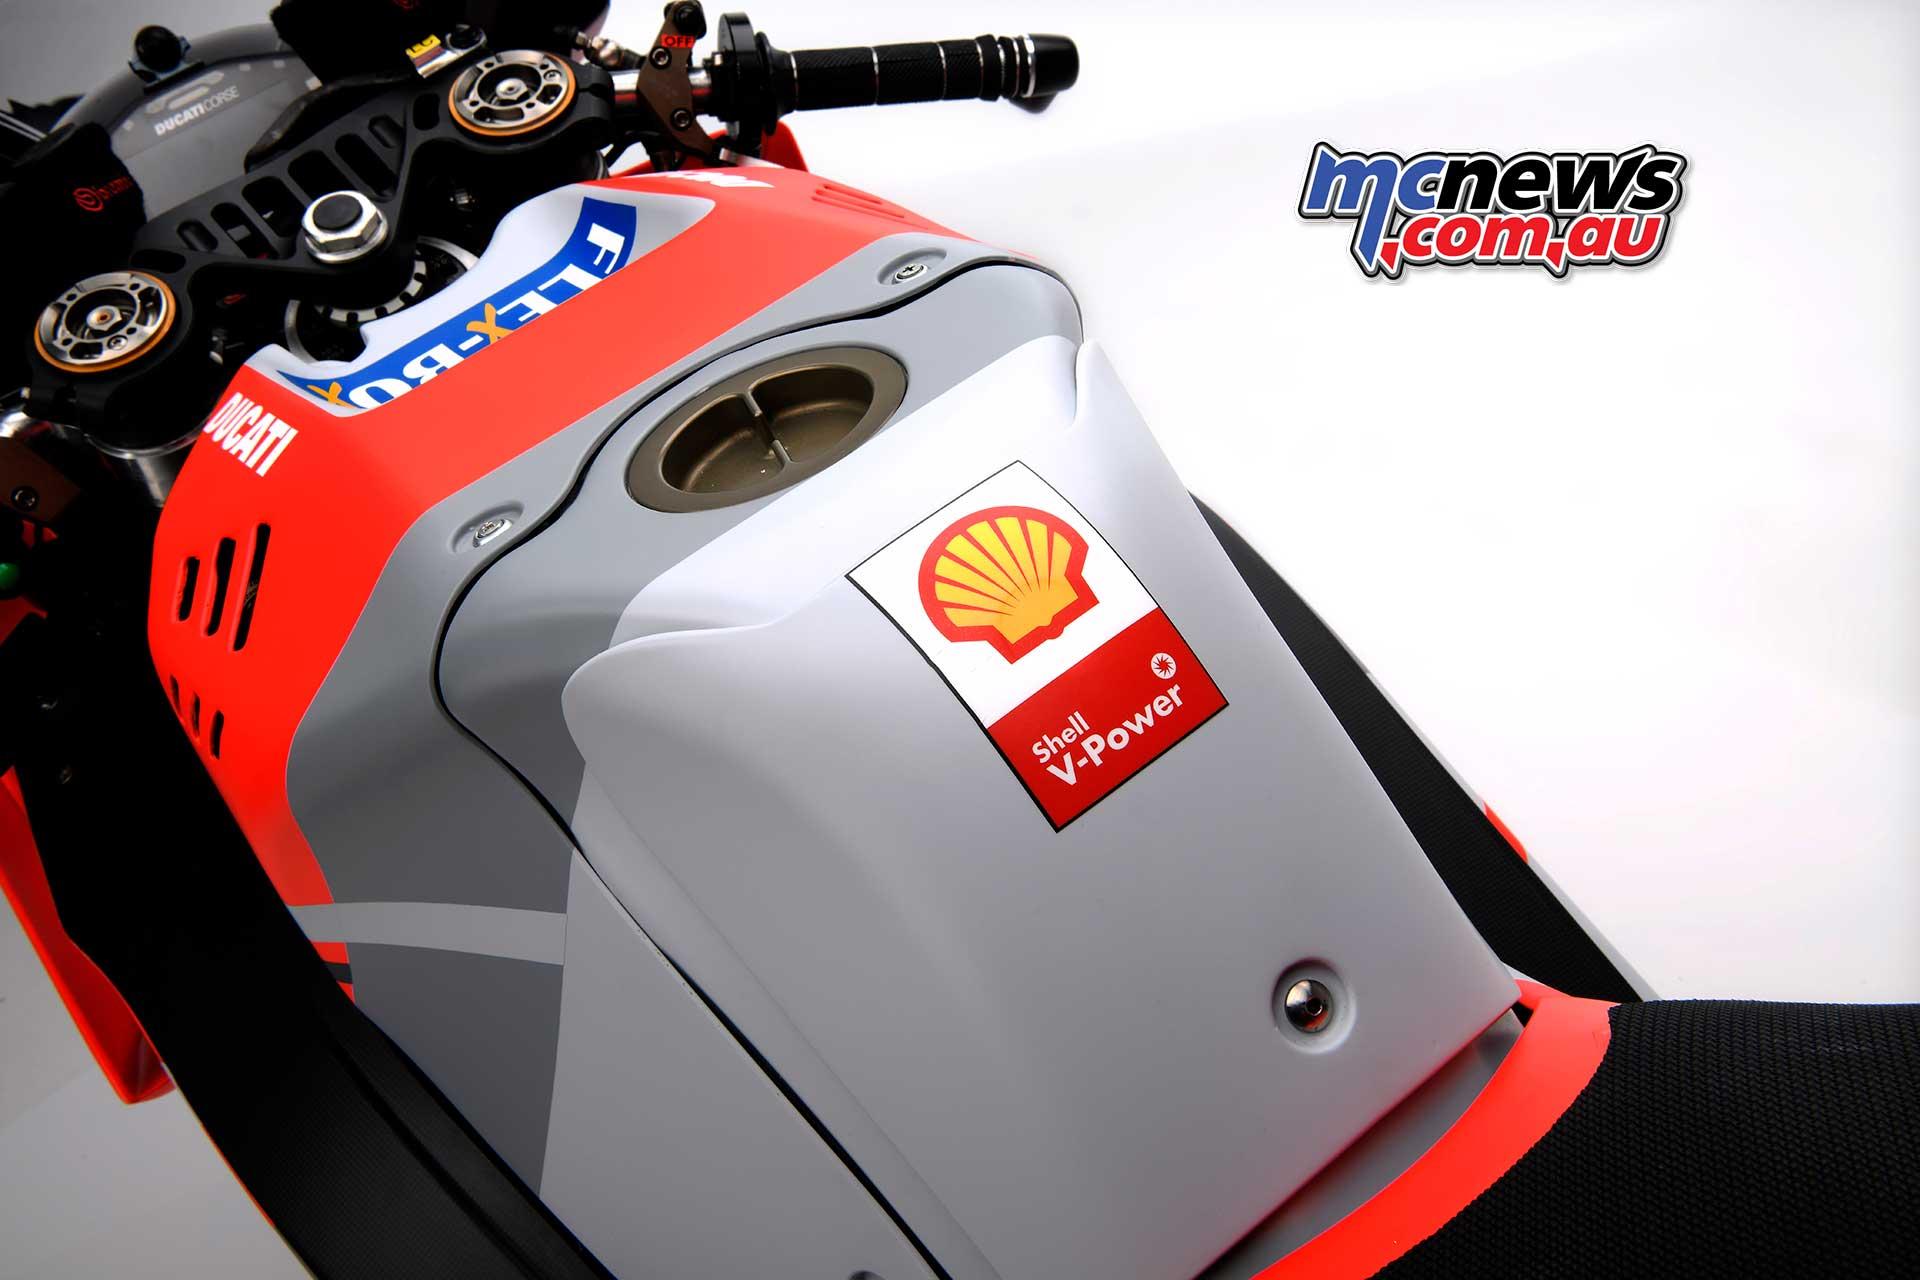 2018 Ducati Desmosedici GP in Detail | Image Gallery | MCNews.com.au